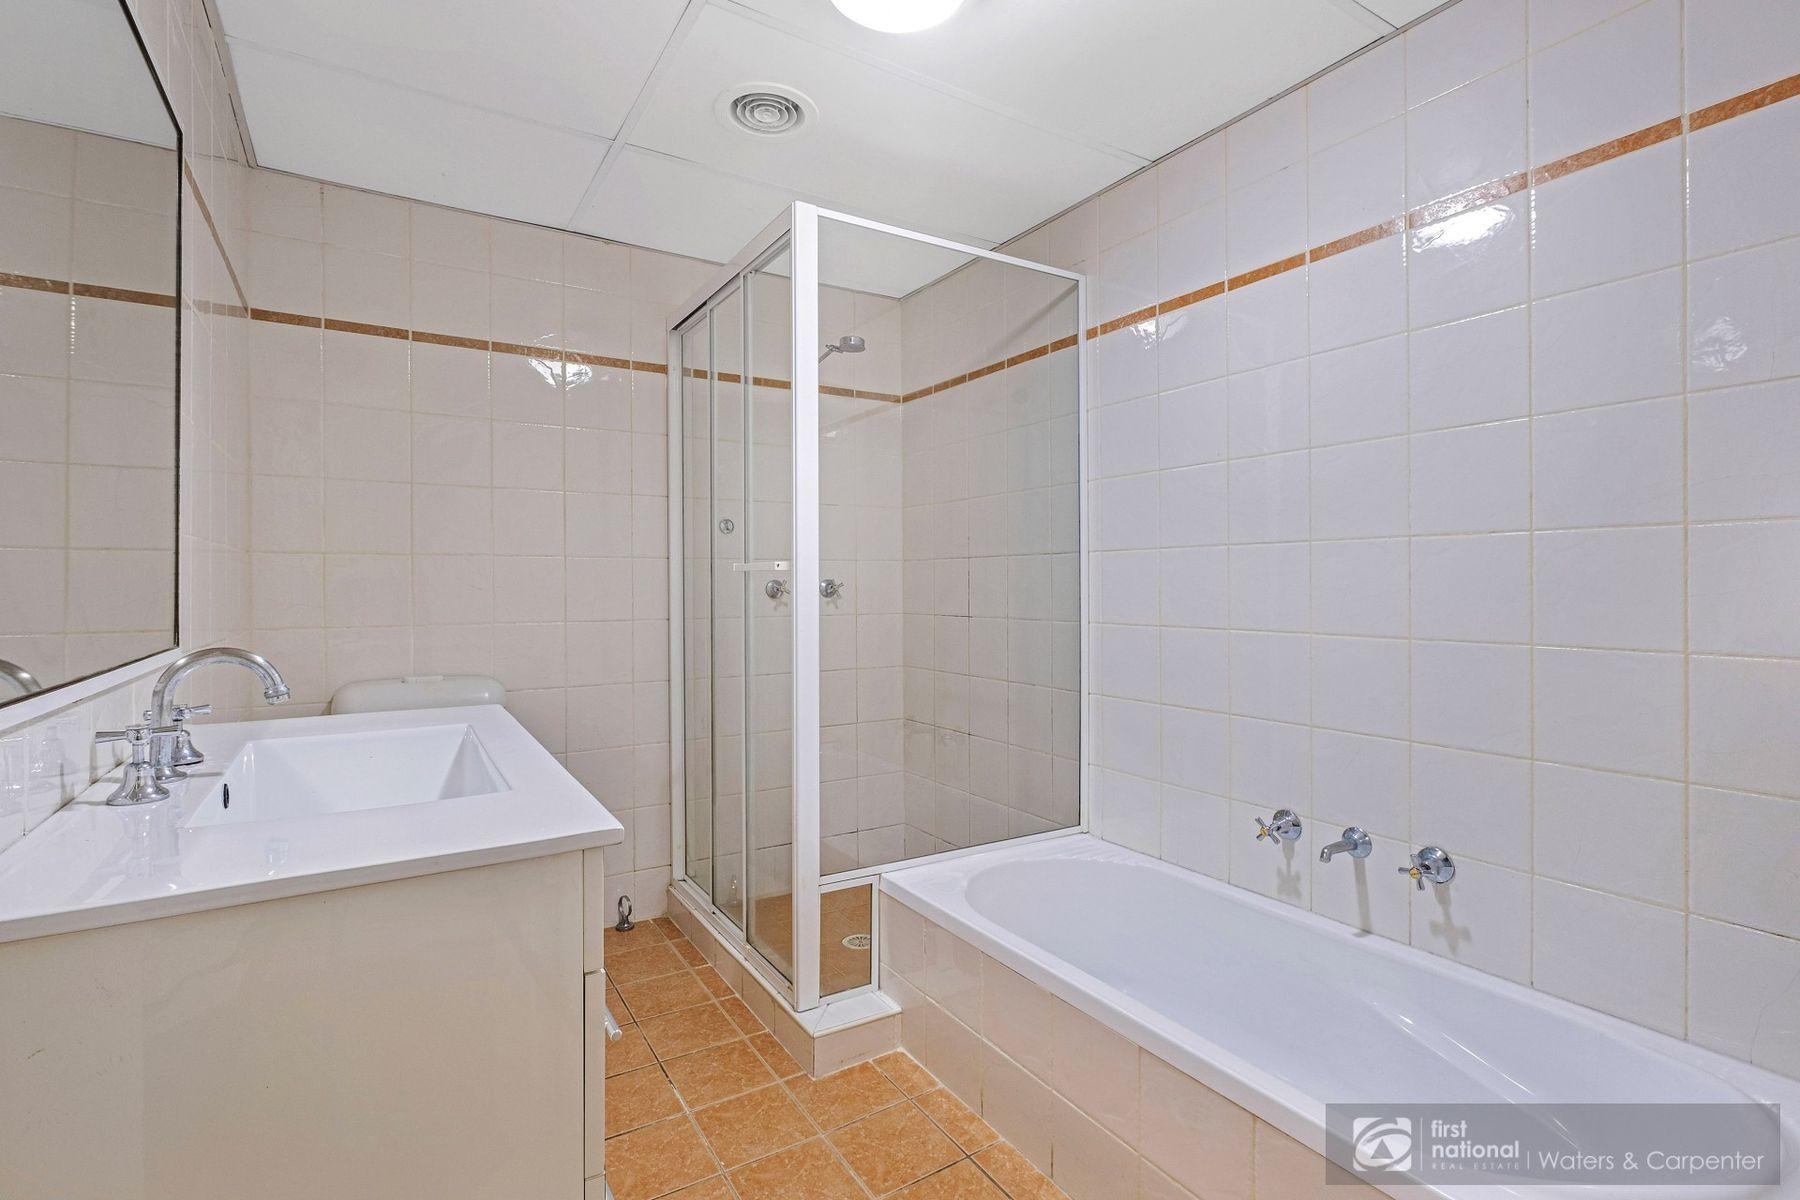 3/30-32 Meehan Street, Granville, NSW 2142